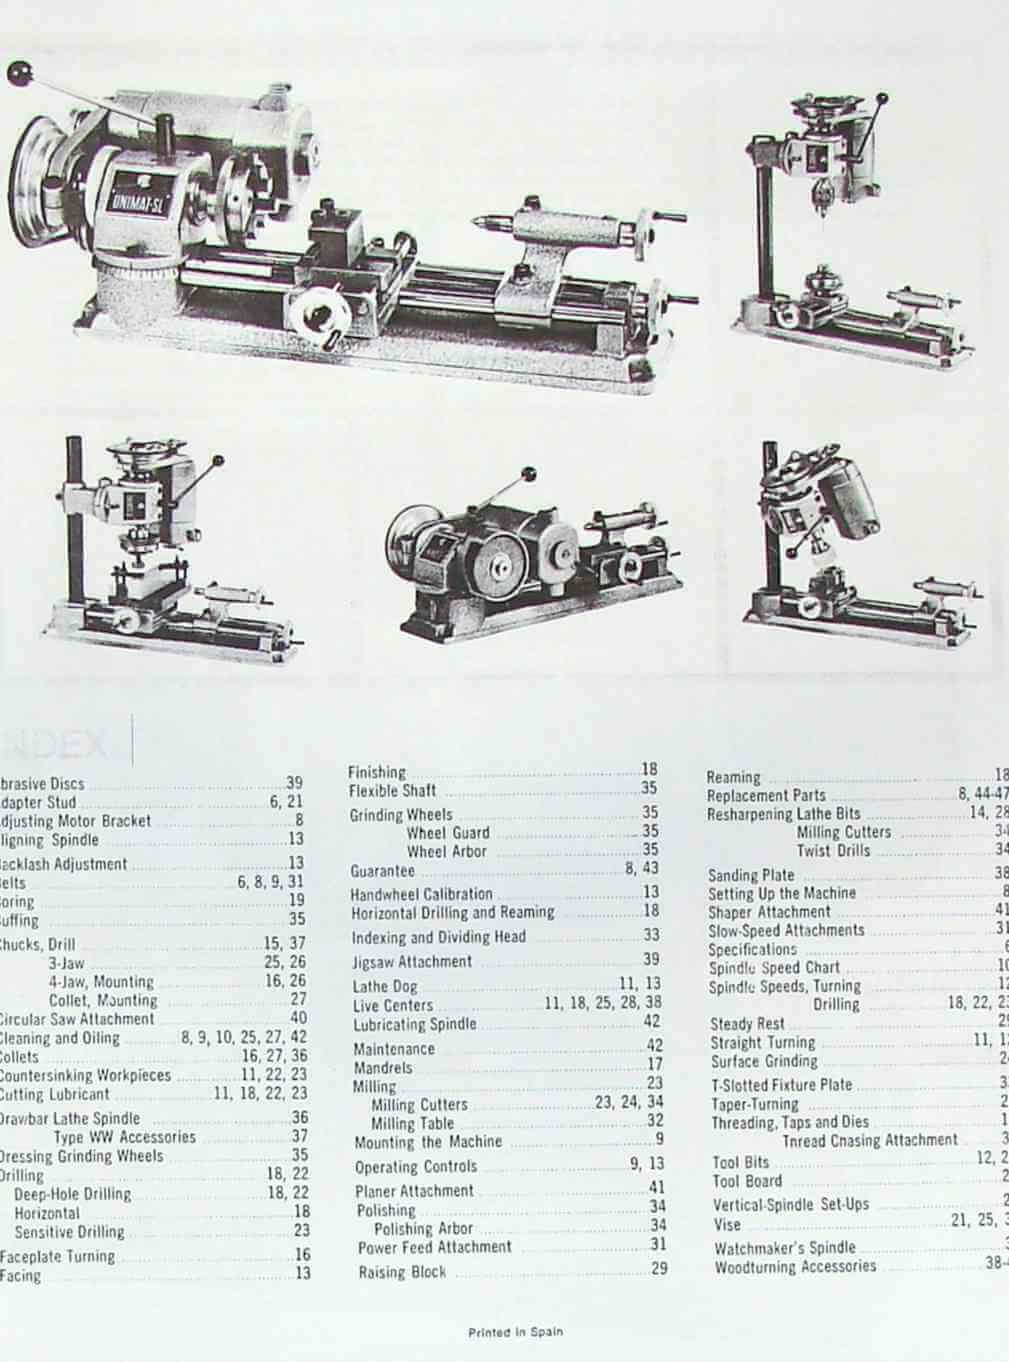 UNIMAT-SL Miniature Machine Handbook & Techniques Operator's Manual | Ozark Tool Manuals & Books